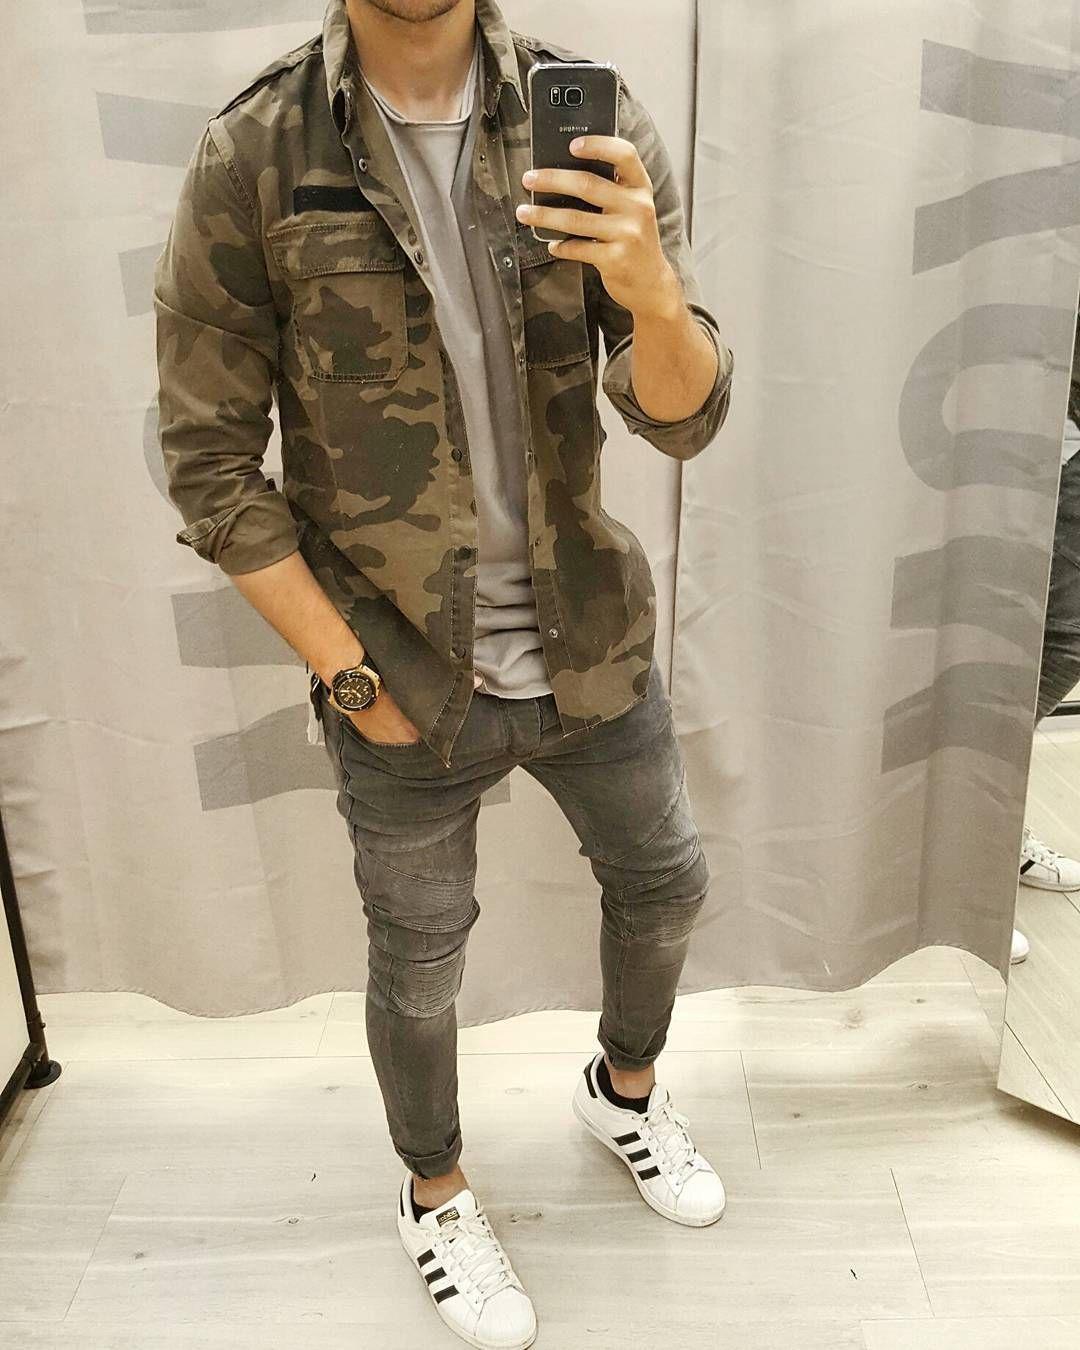 ea4bfcccfda Camuflado | Mis fachas | Moda estilo, Estilos de moda masculina, Moda